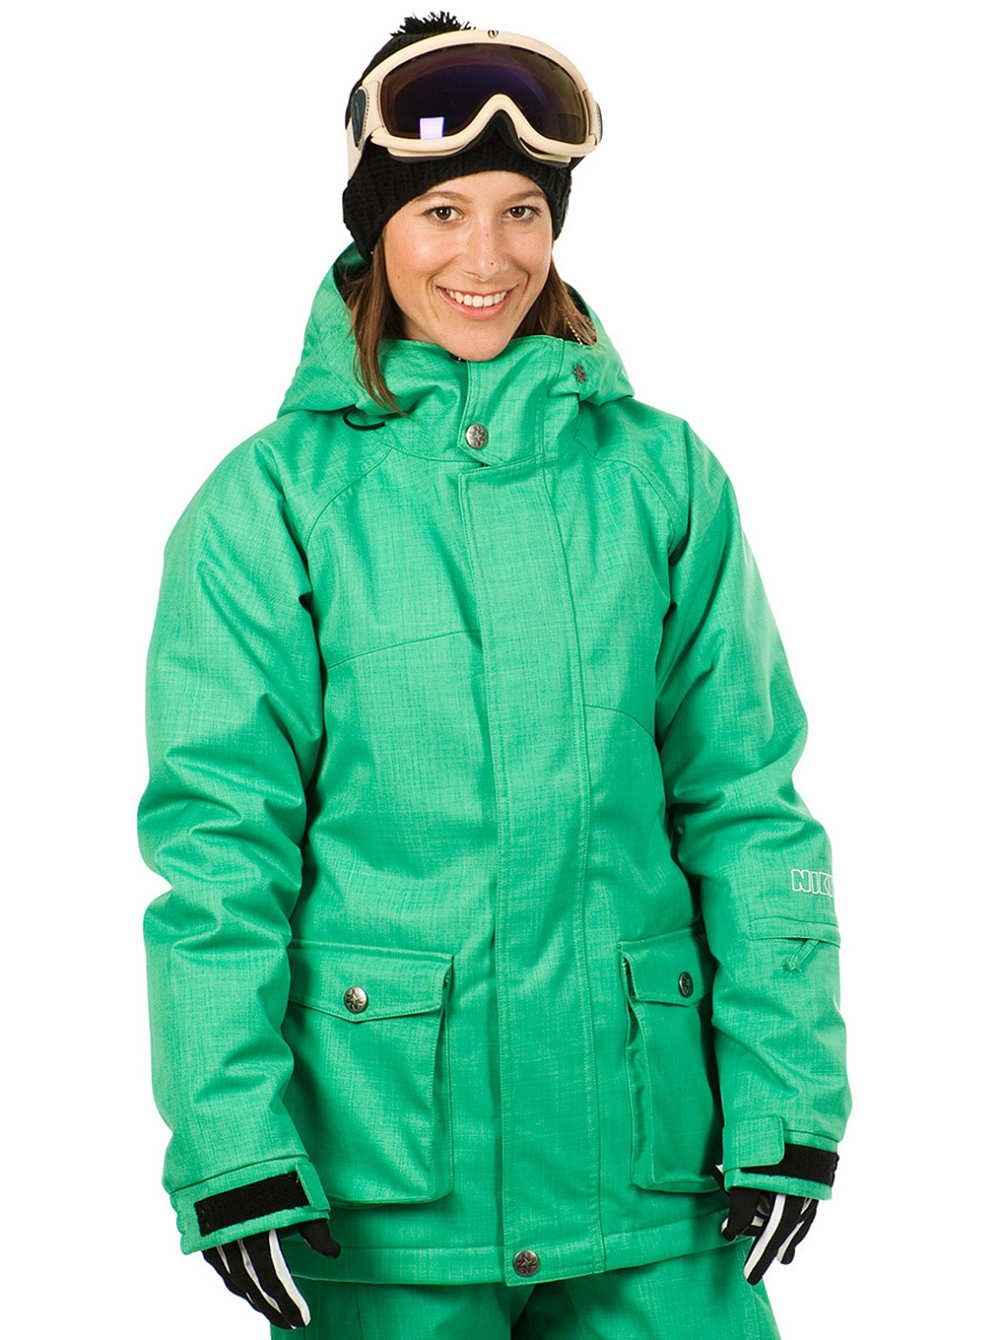 NIKITA Damen Snowboardjacke günstig online kaufen